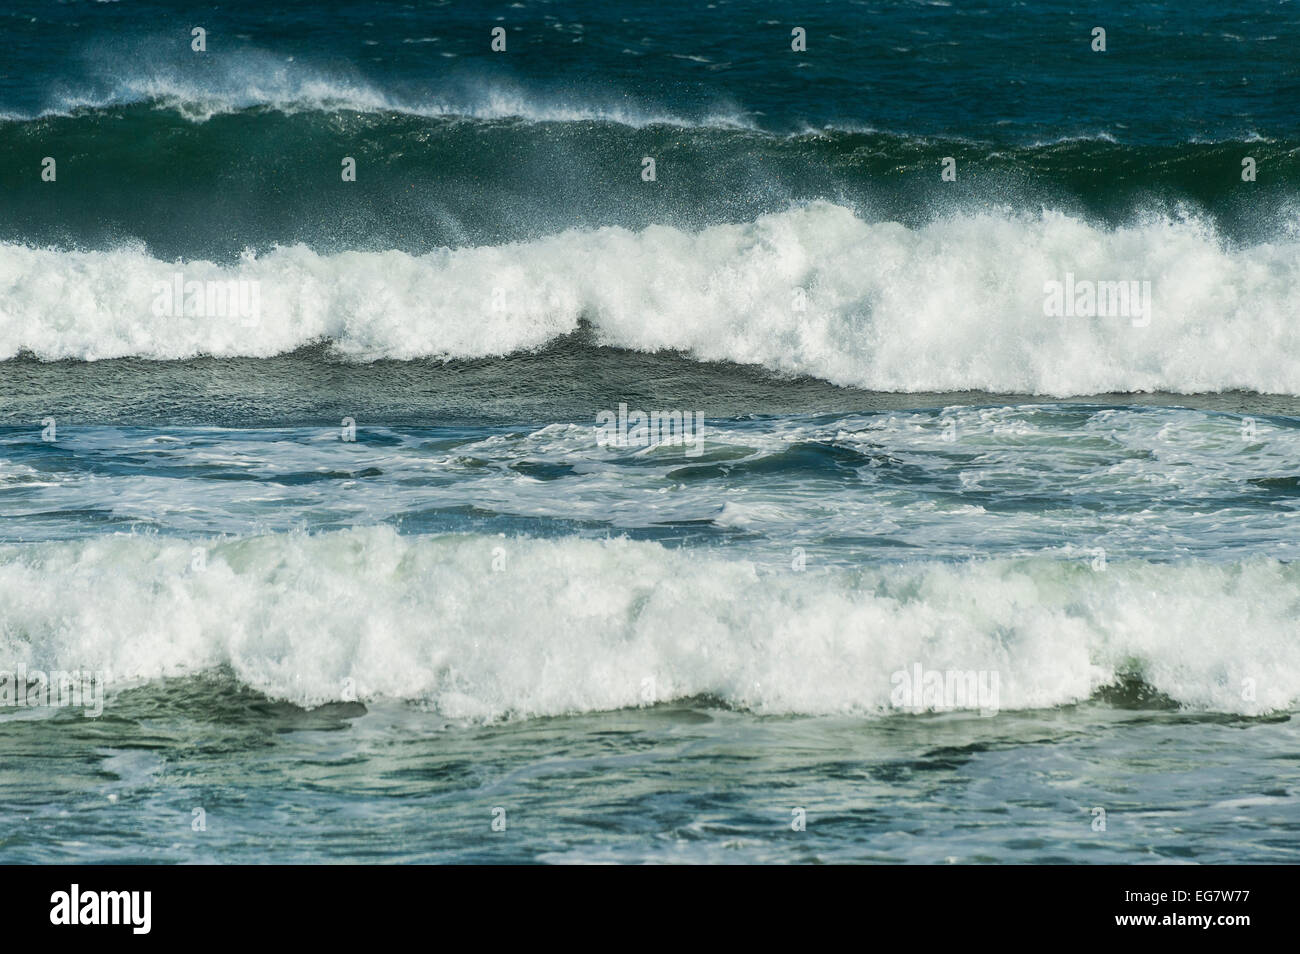 Cresting ocean waves. Stock Photo